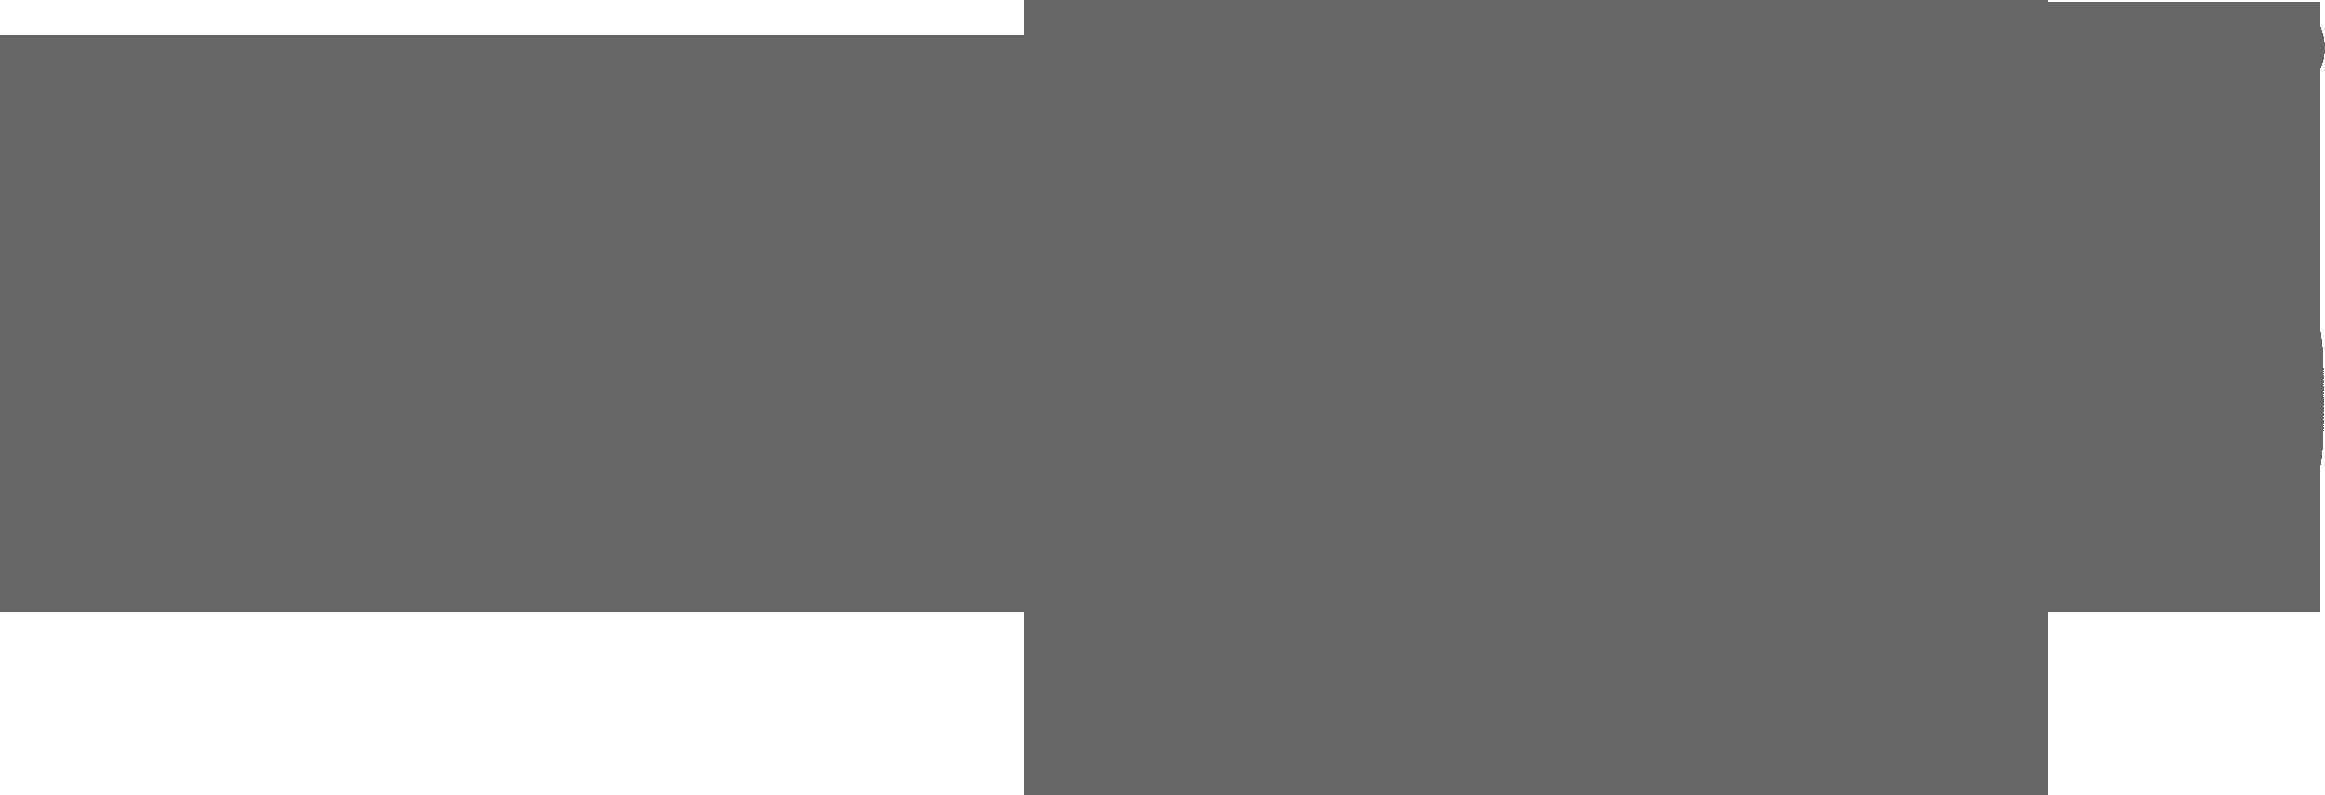 logo_sivalbp.png